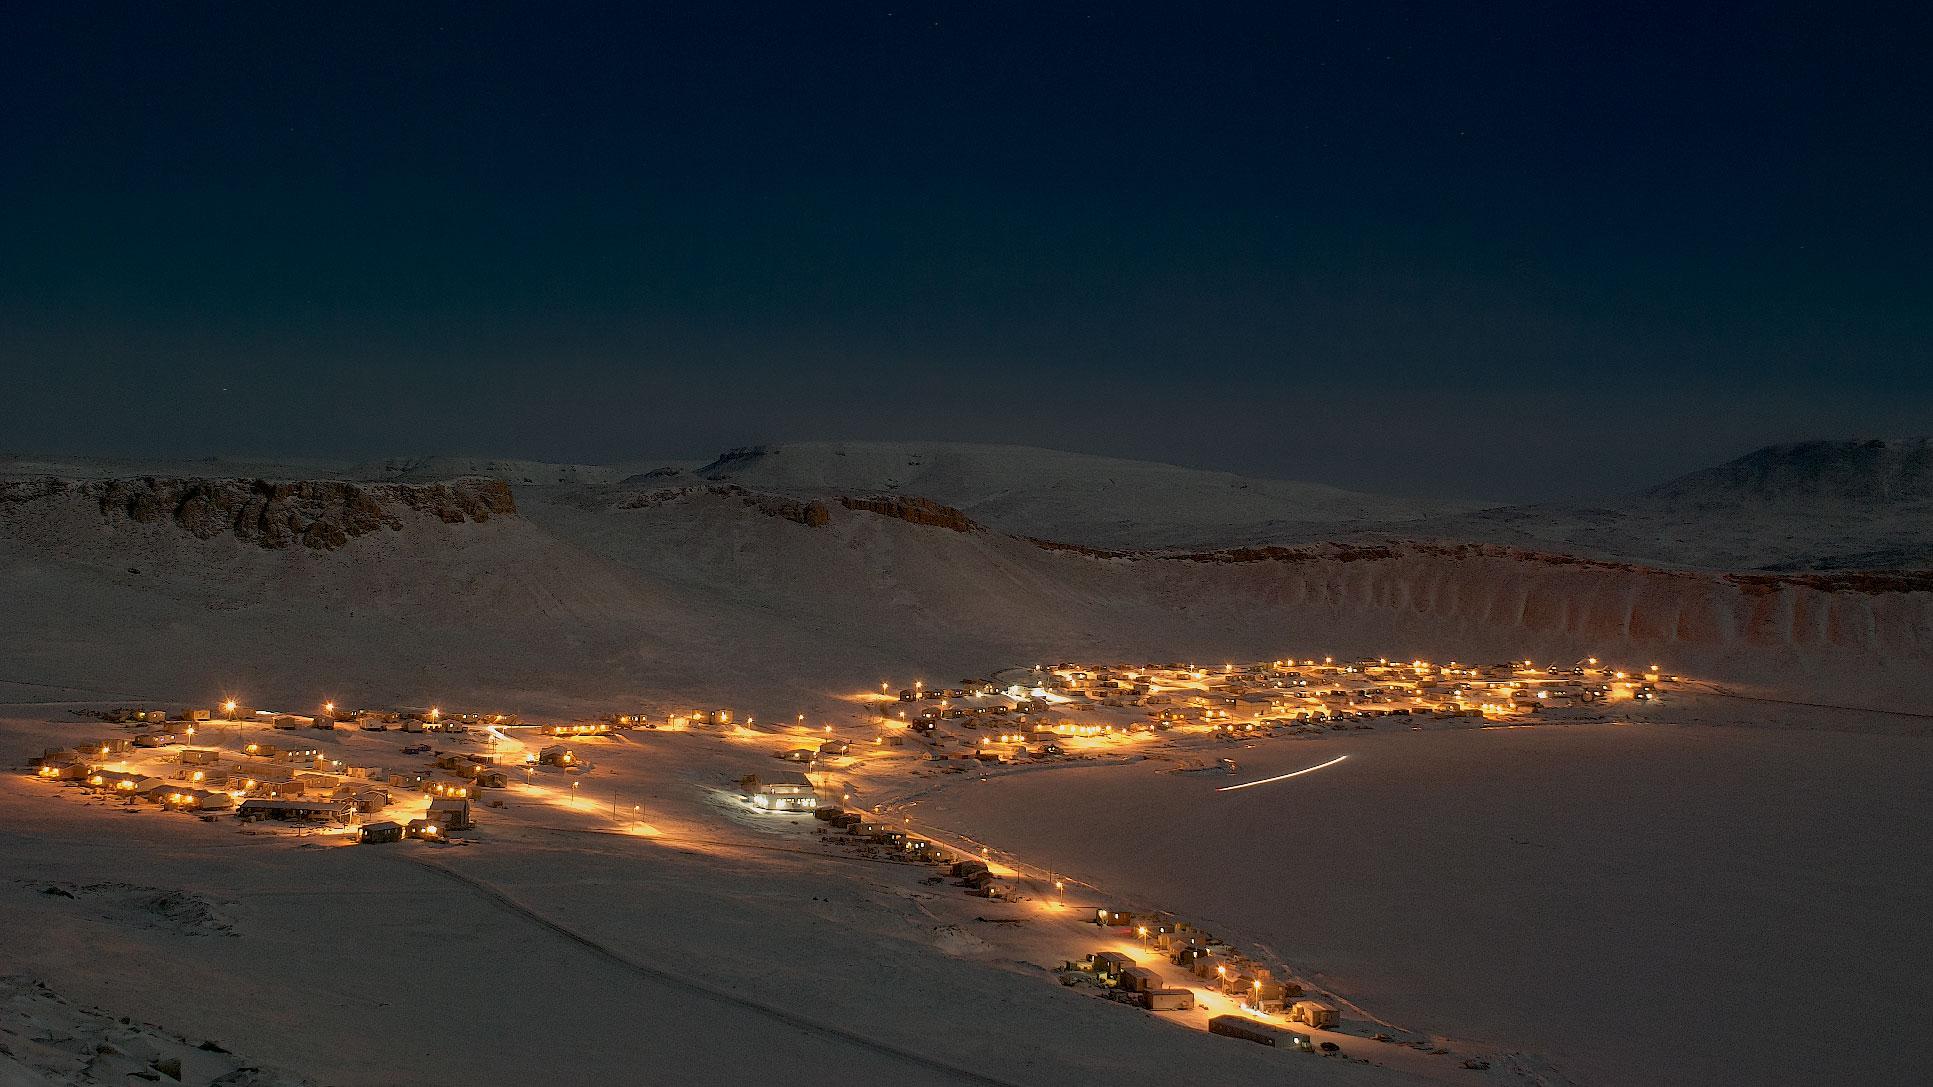 Photo credit: Arctic Bay, Nunavut; photograph by Bobby Kilabuk, 2014.